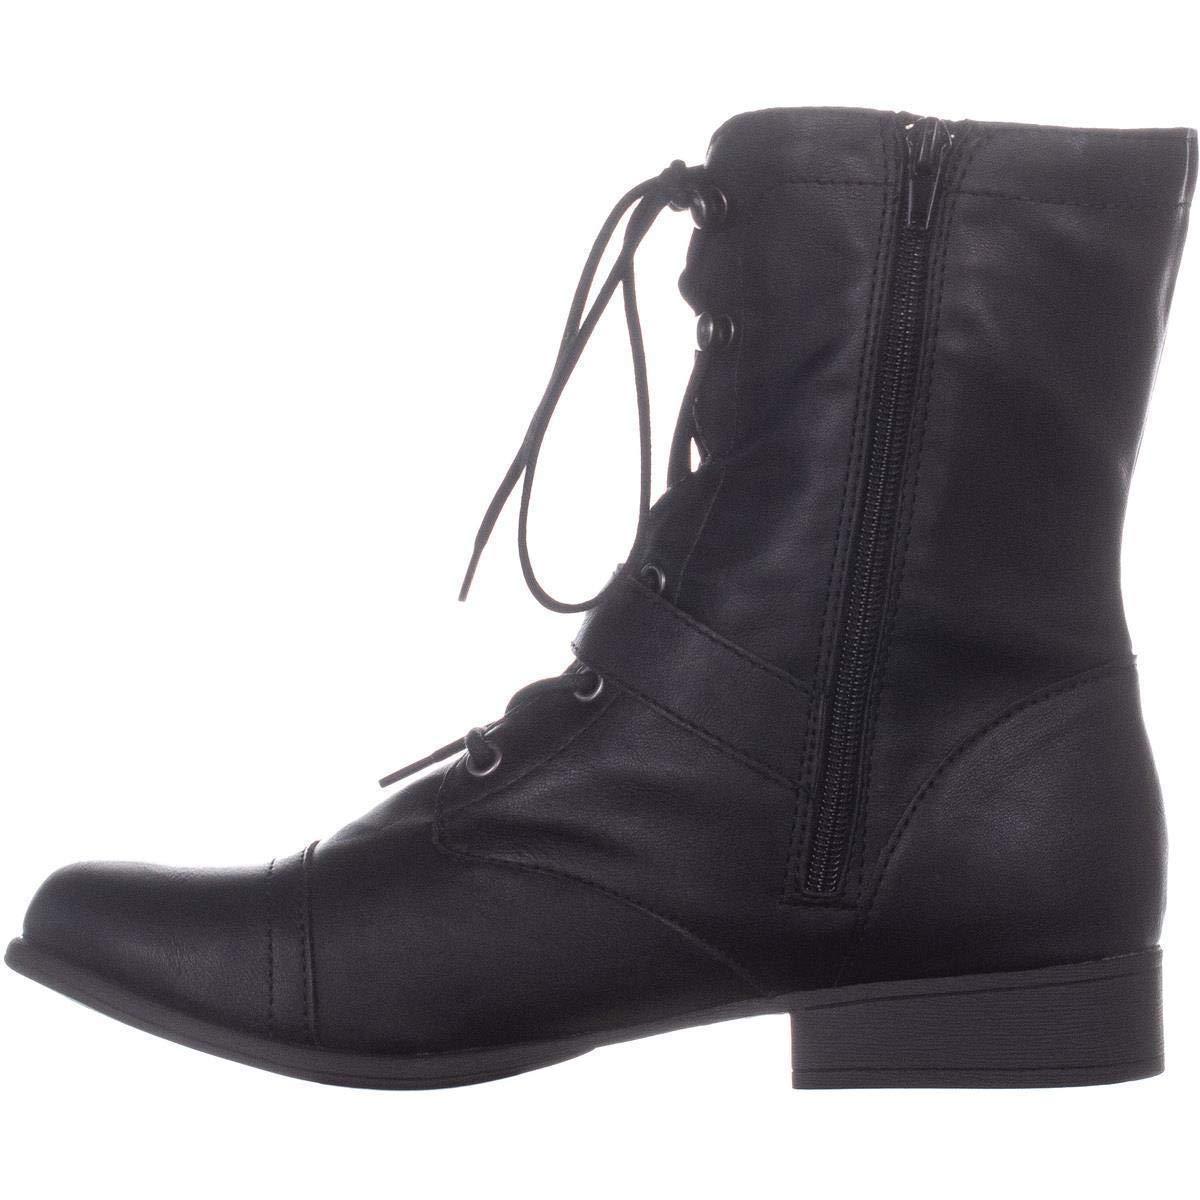 51243c6d8391b American Rag Womens Afarahh Round Toe Ankle Combat Boots | eBay